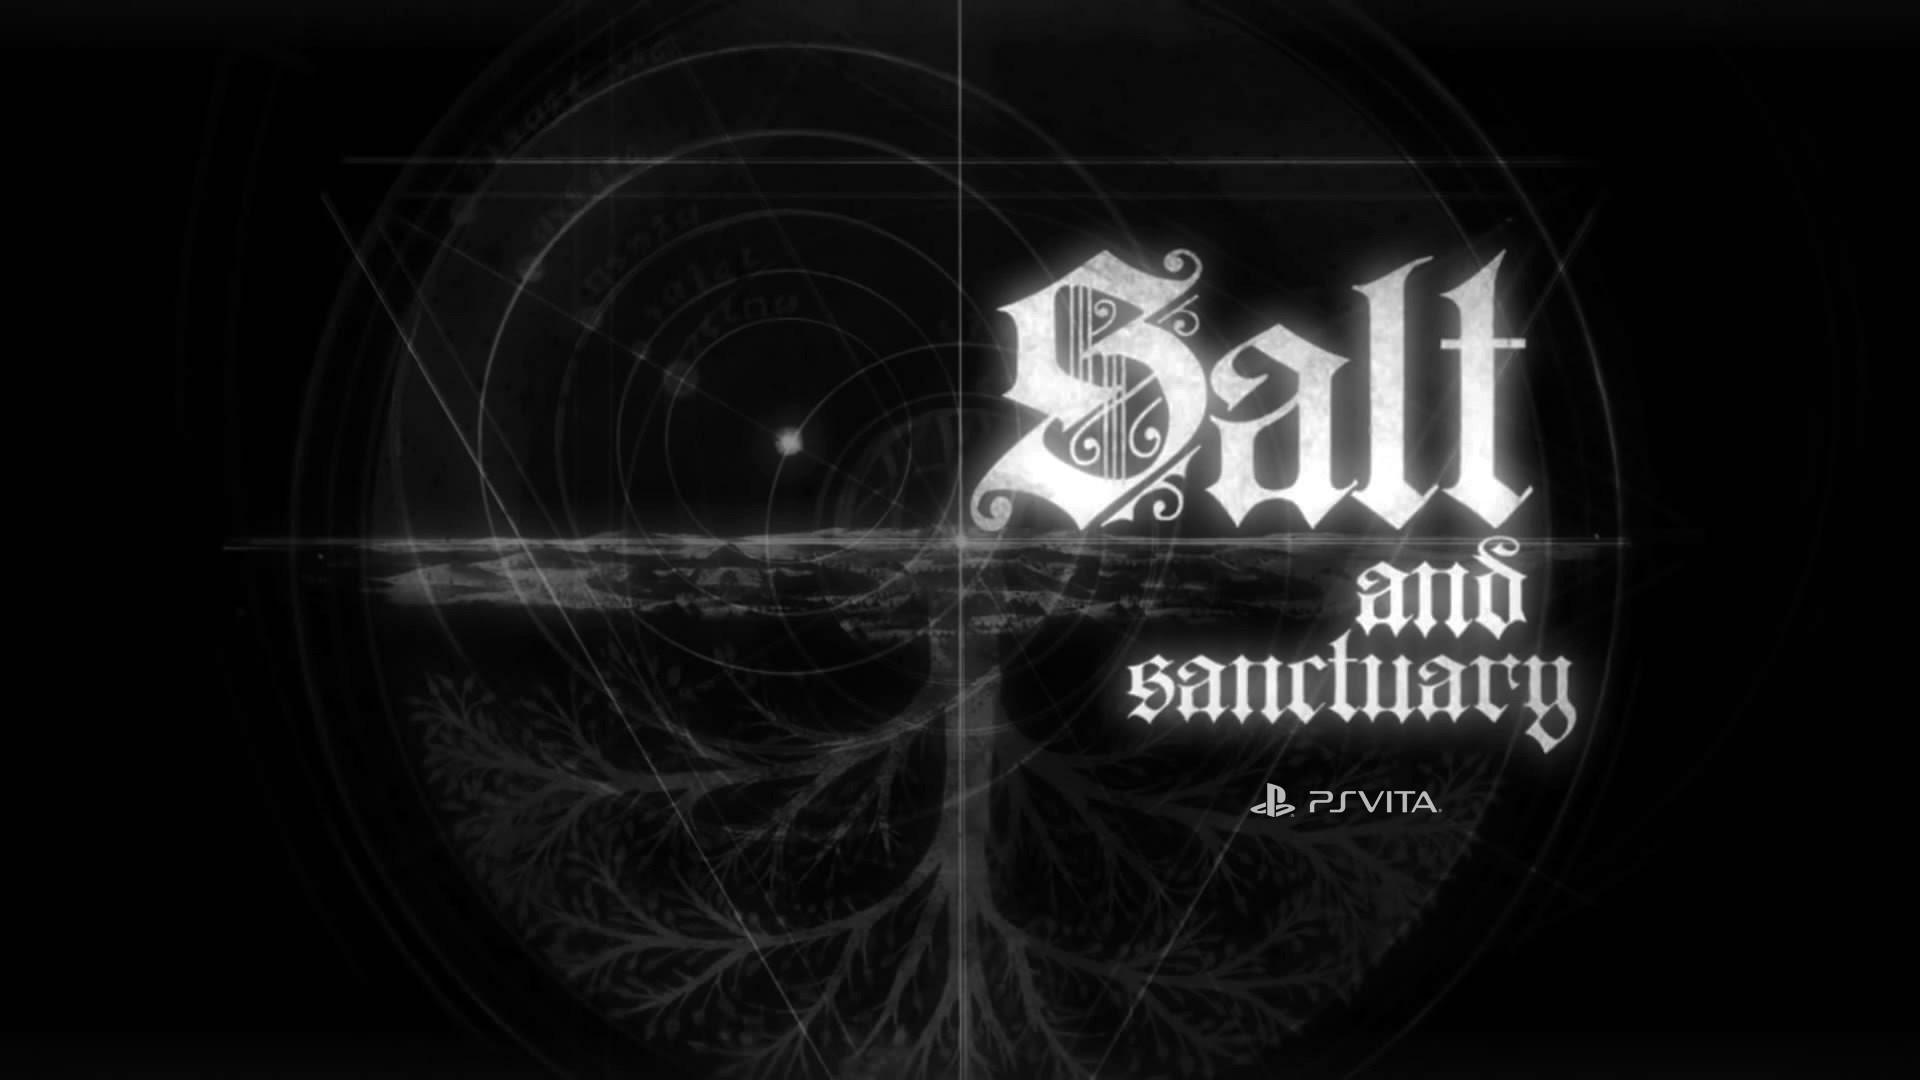 Salt and Sanctuary Pictures Salt and Sanctuary HQ wallpapers